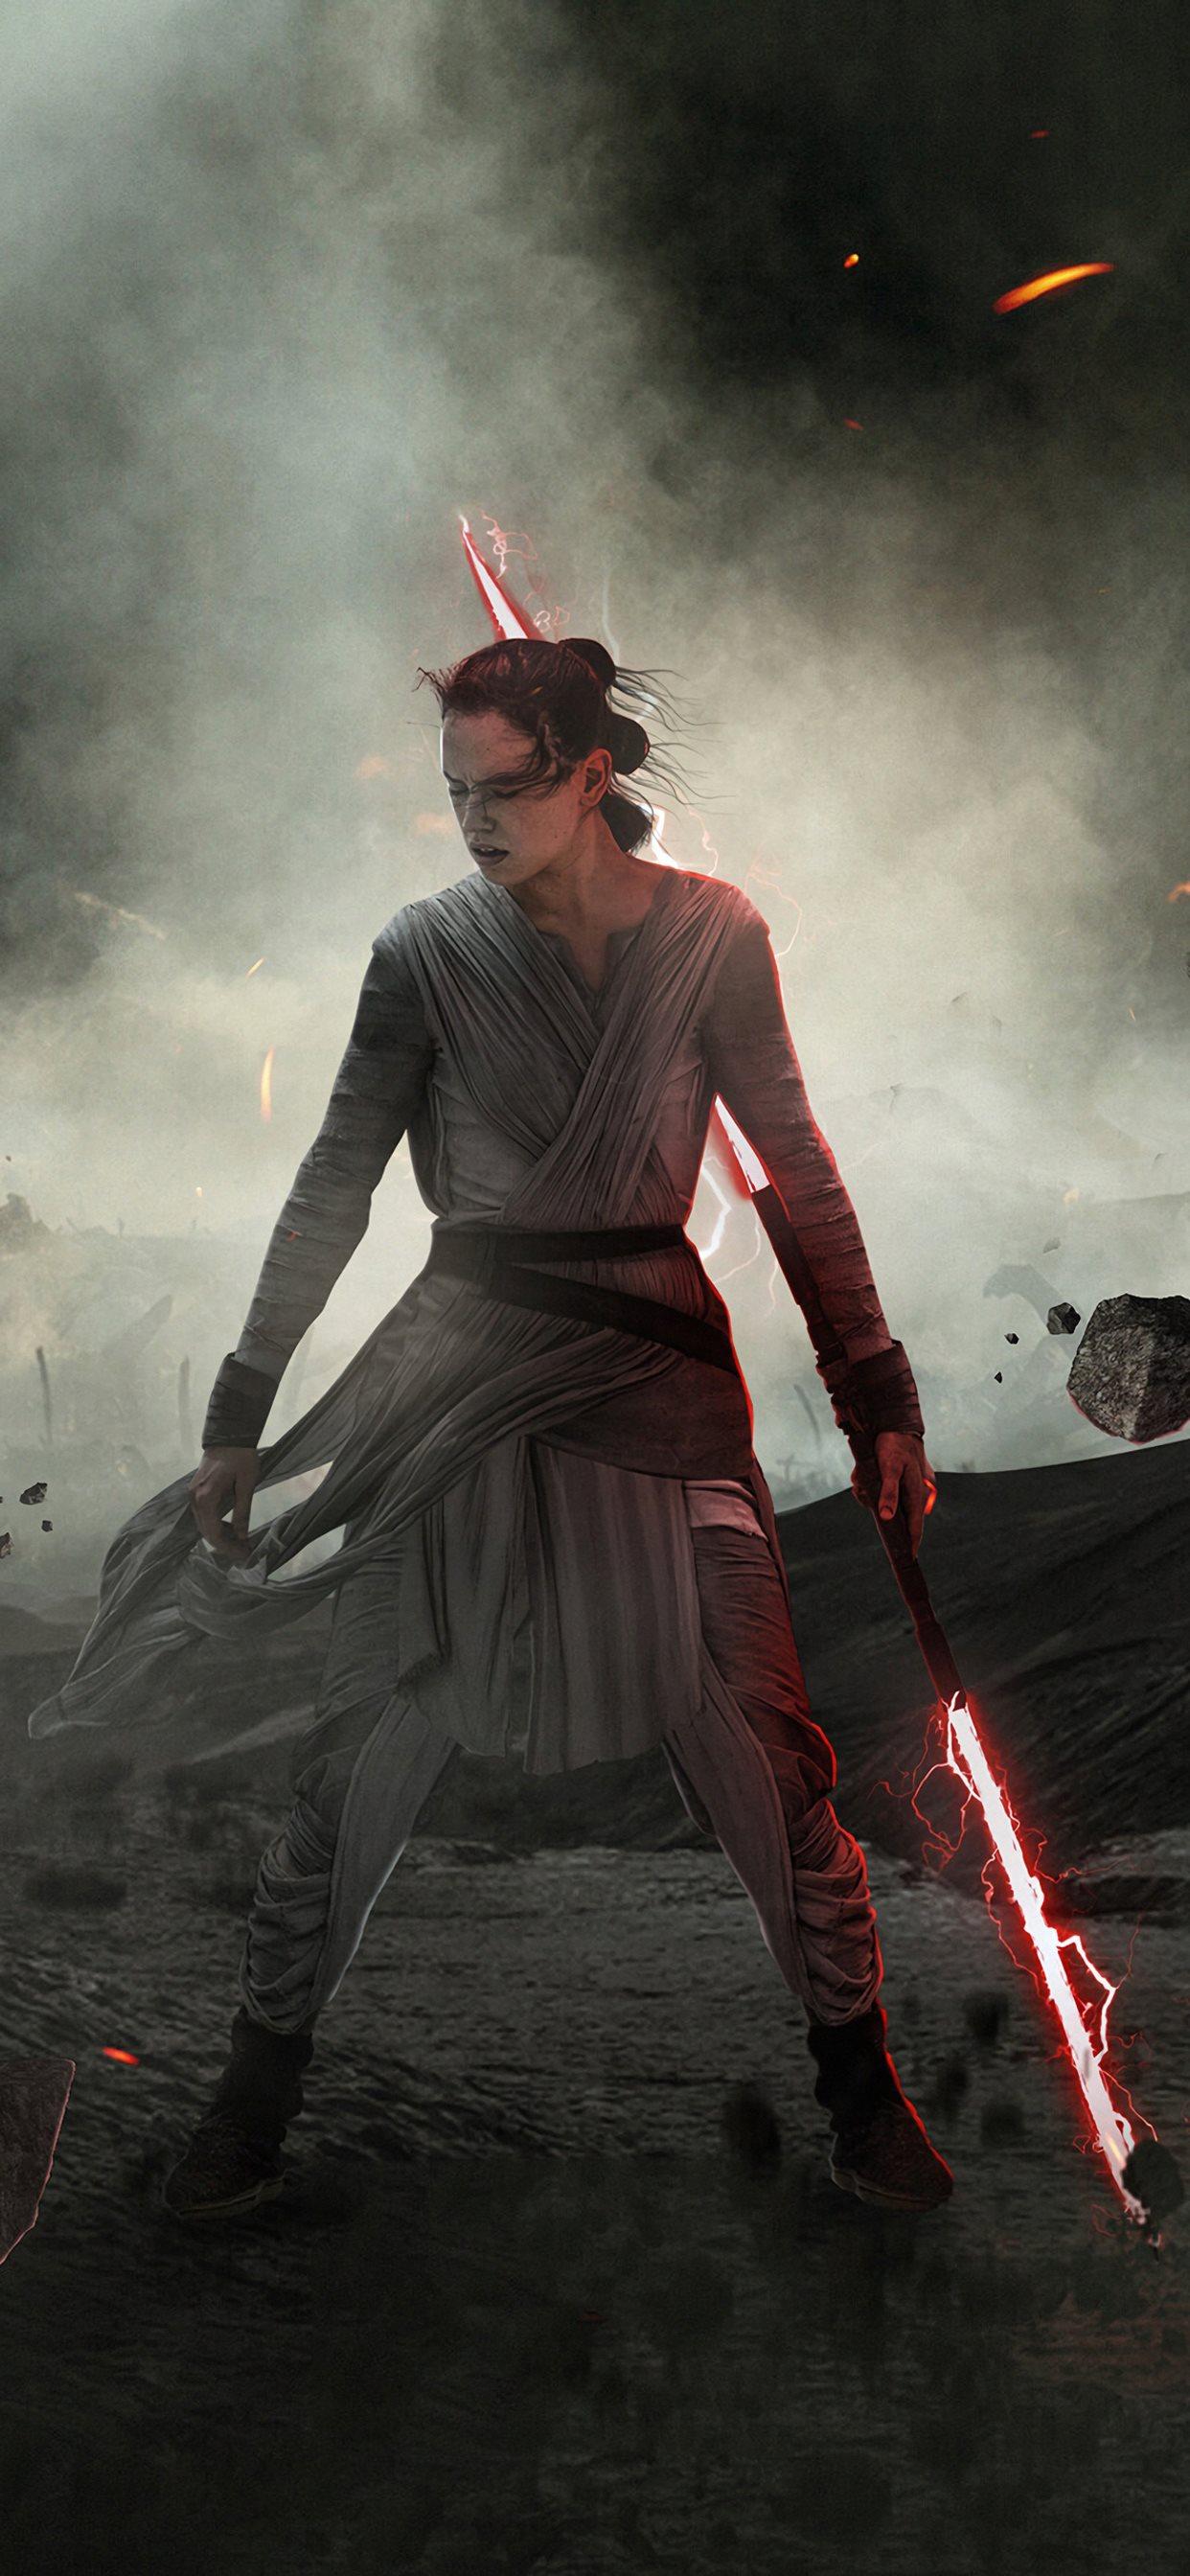 Dark Rey Star Wars The Rise Of Skywalker Iphone Wallpapers Free Download